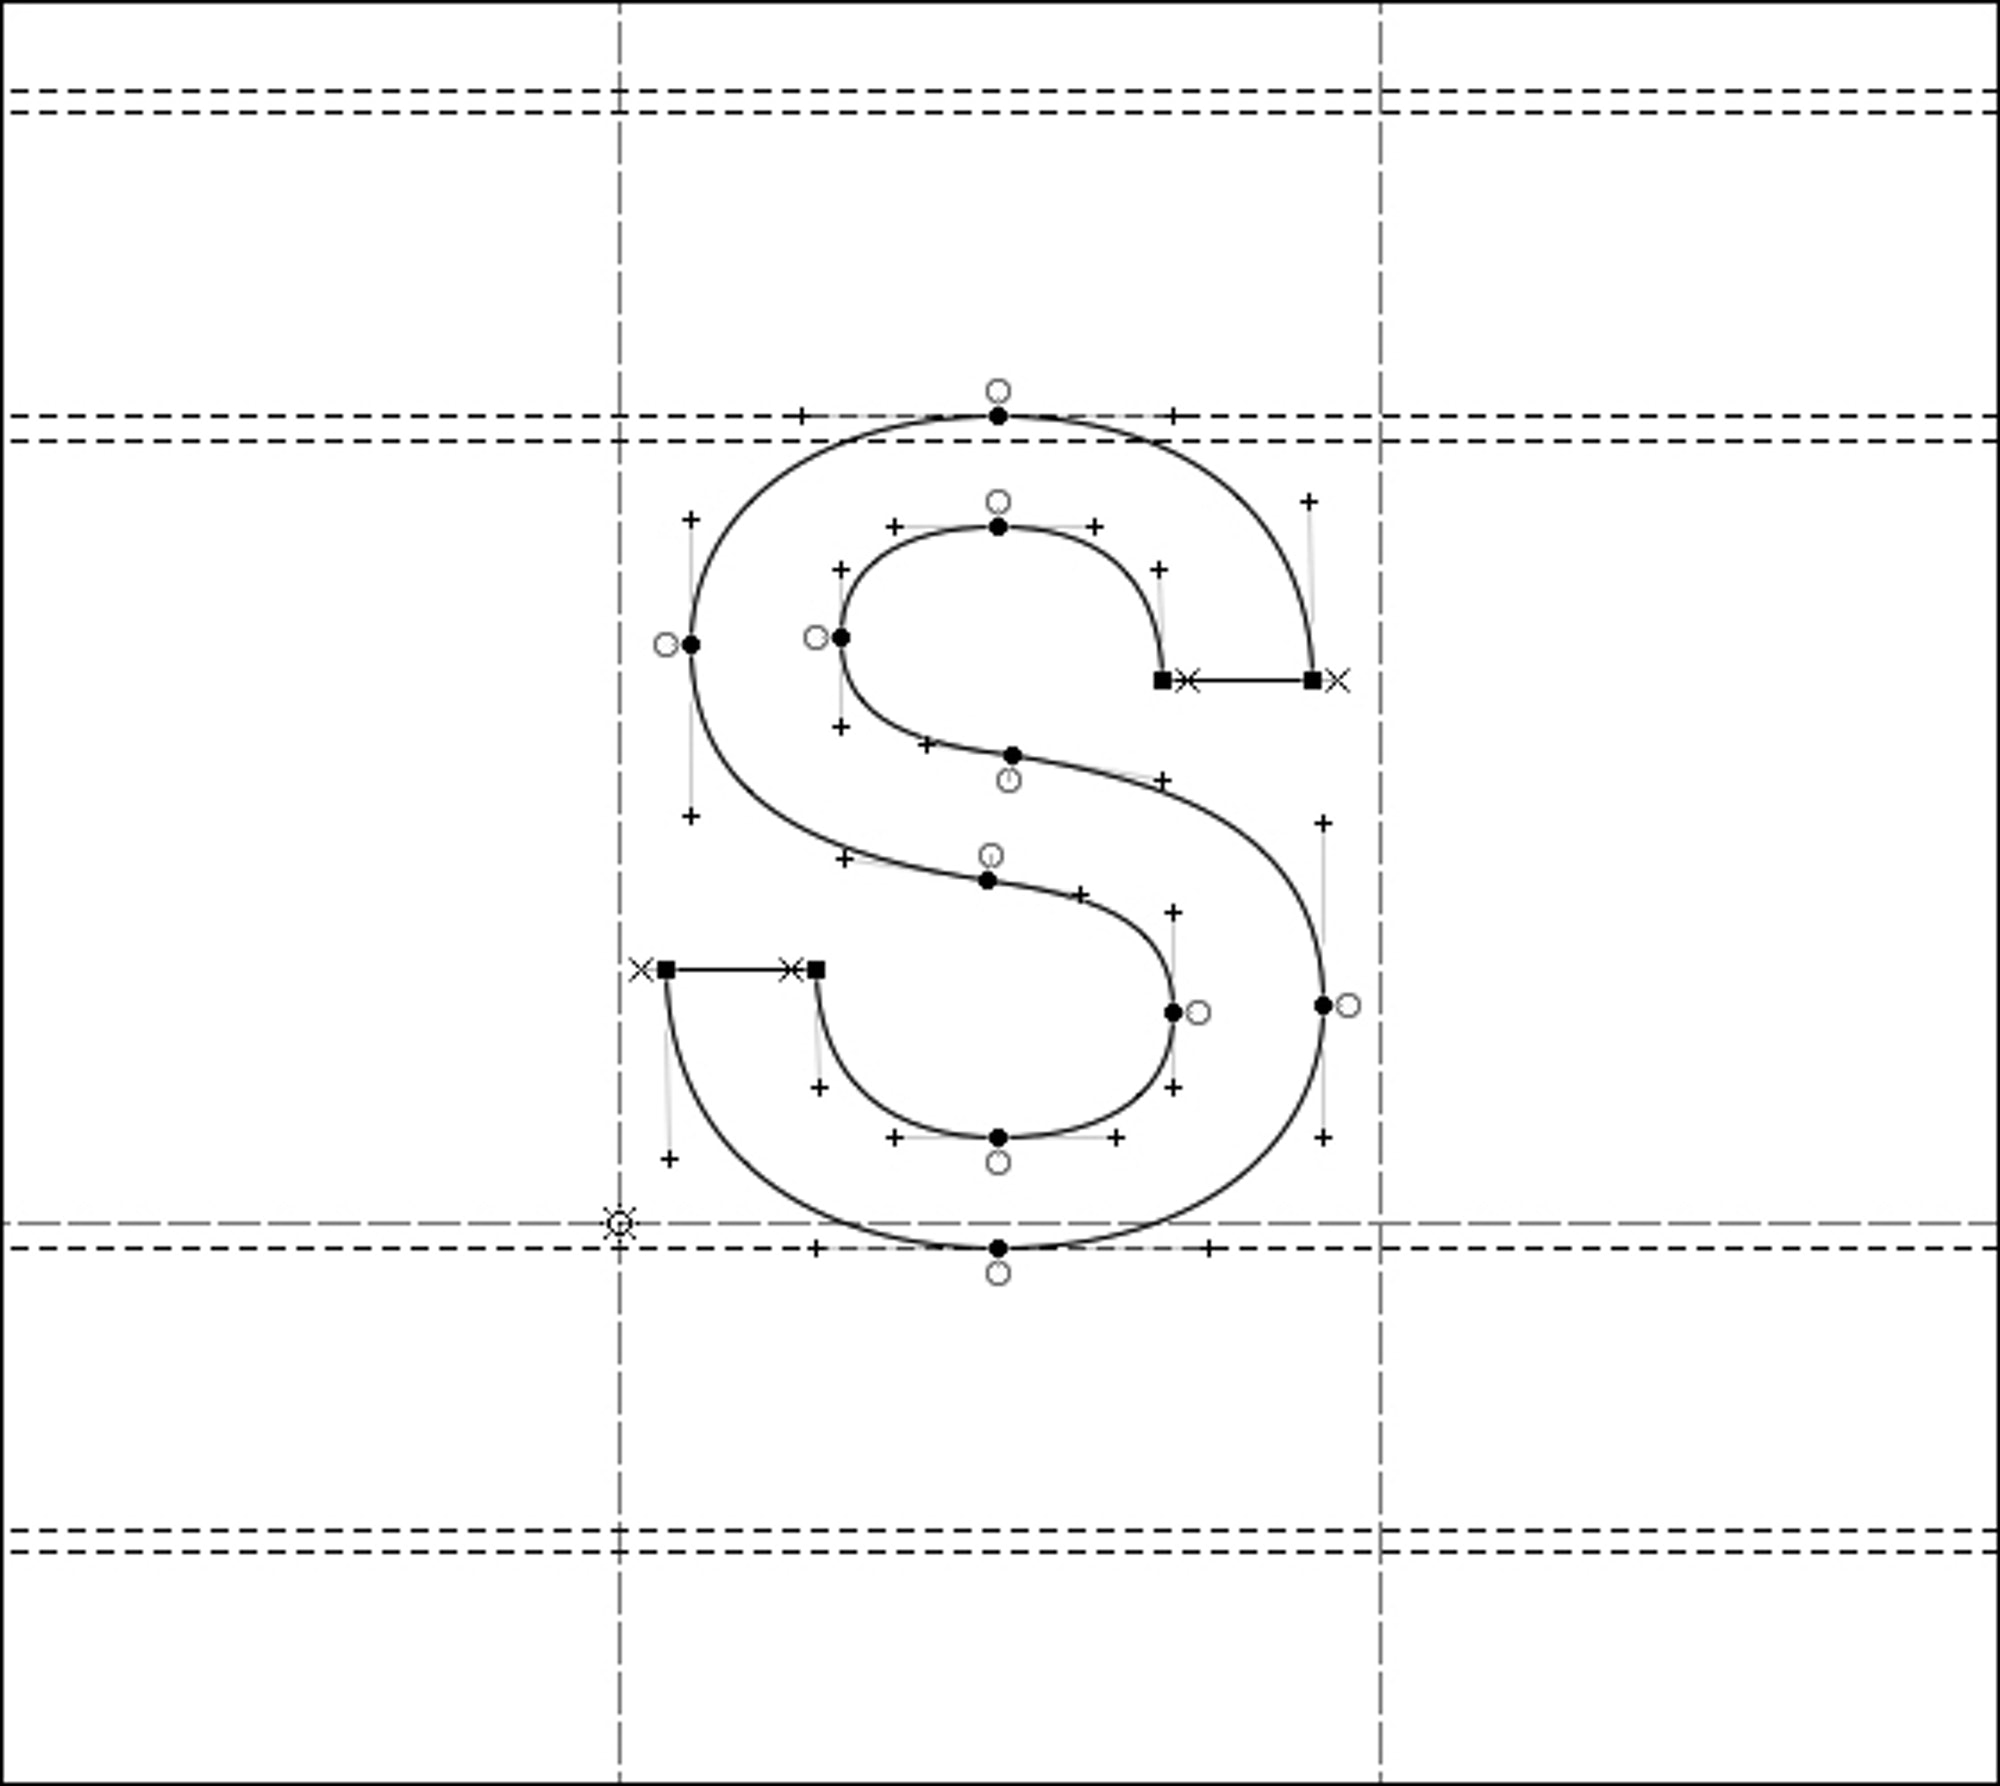 e964832ad De nye skriftdesignerne, del 3: Andrew Osman | Grafill